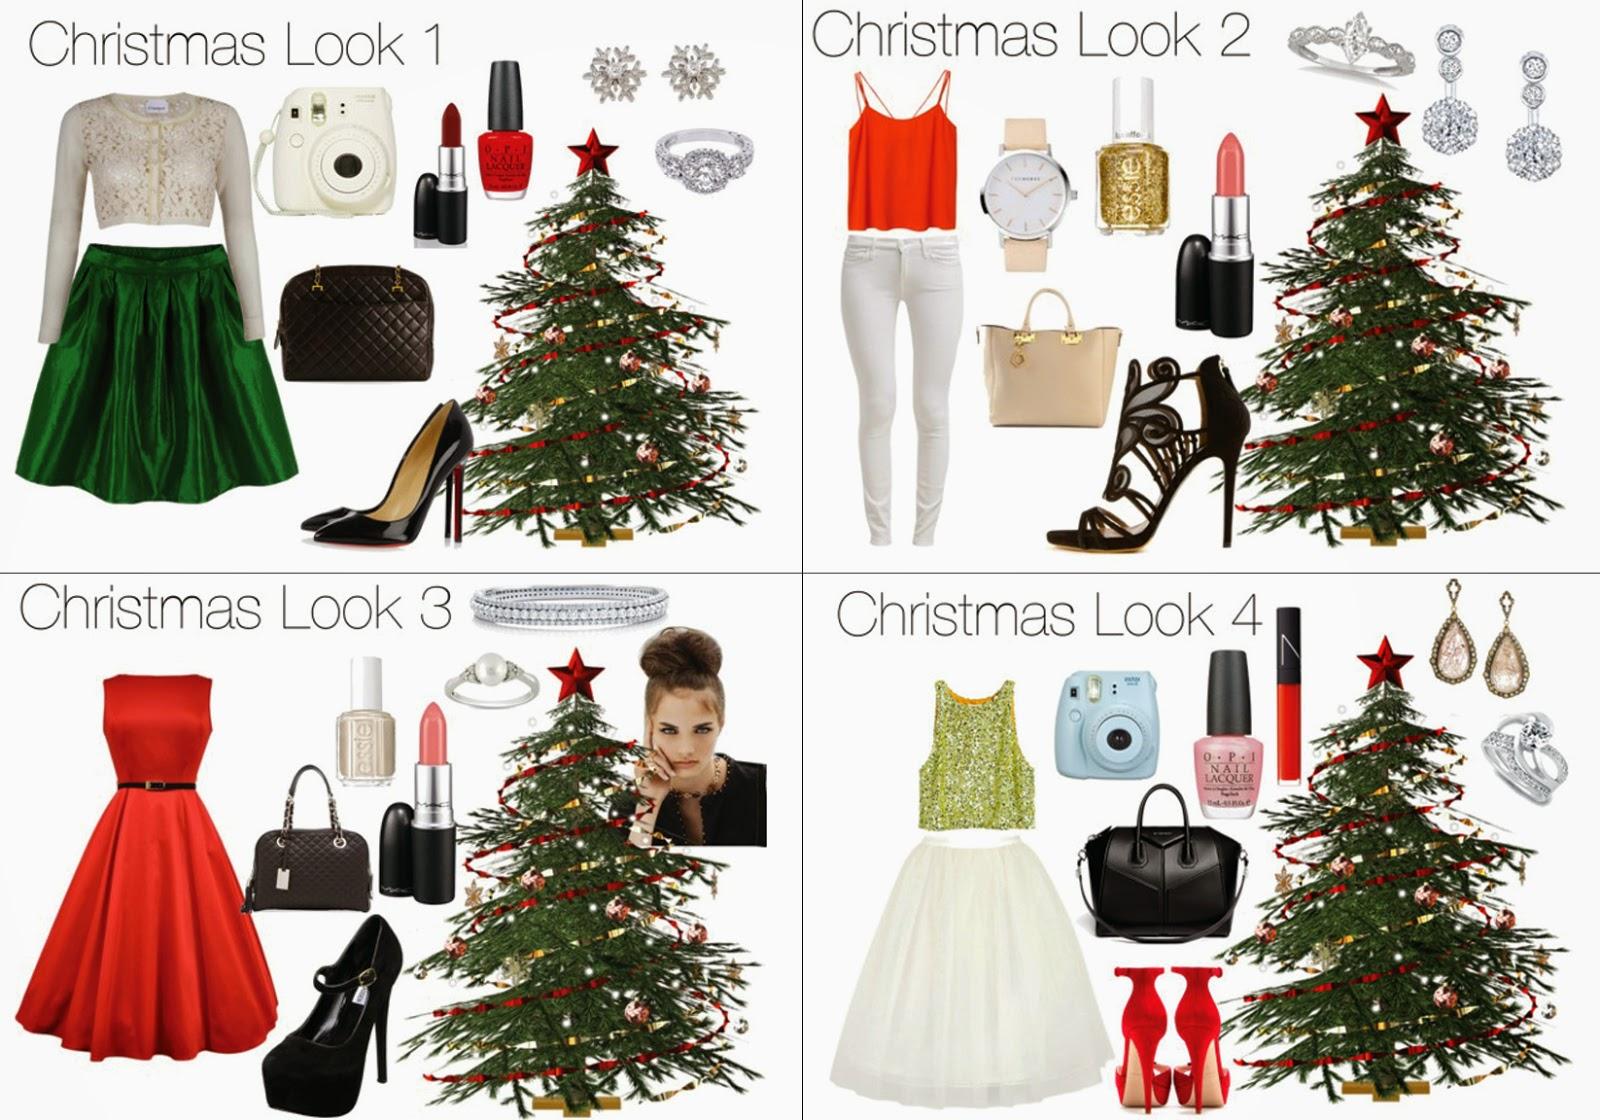 4a80b65c789 Mini lola polyvore christmas outfits jpg 1600x1120 Christmas outfits  polyvore